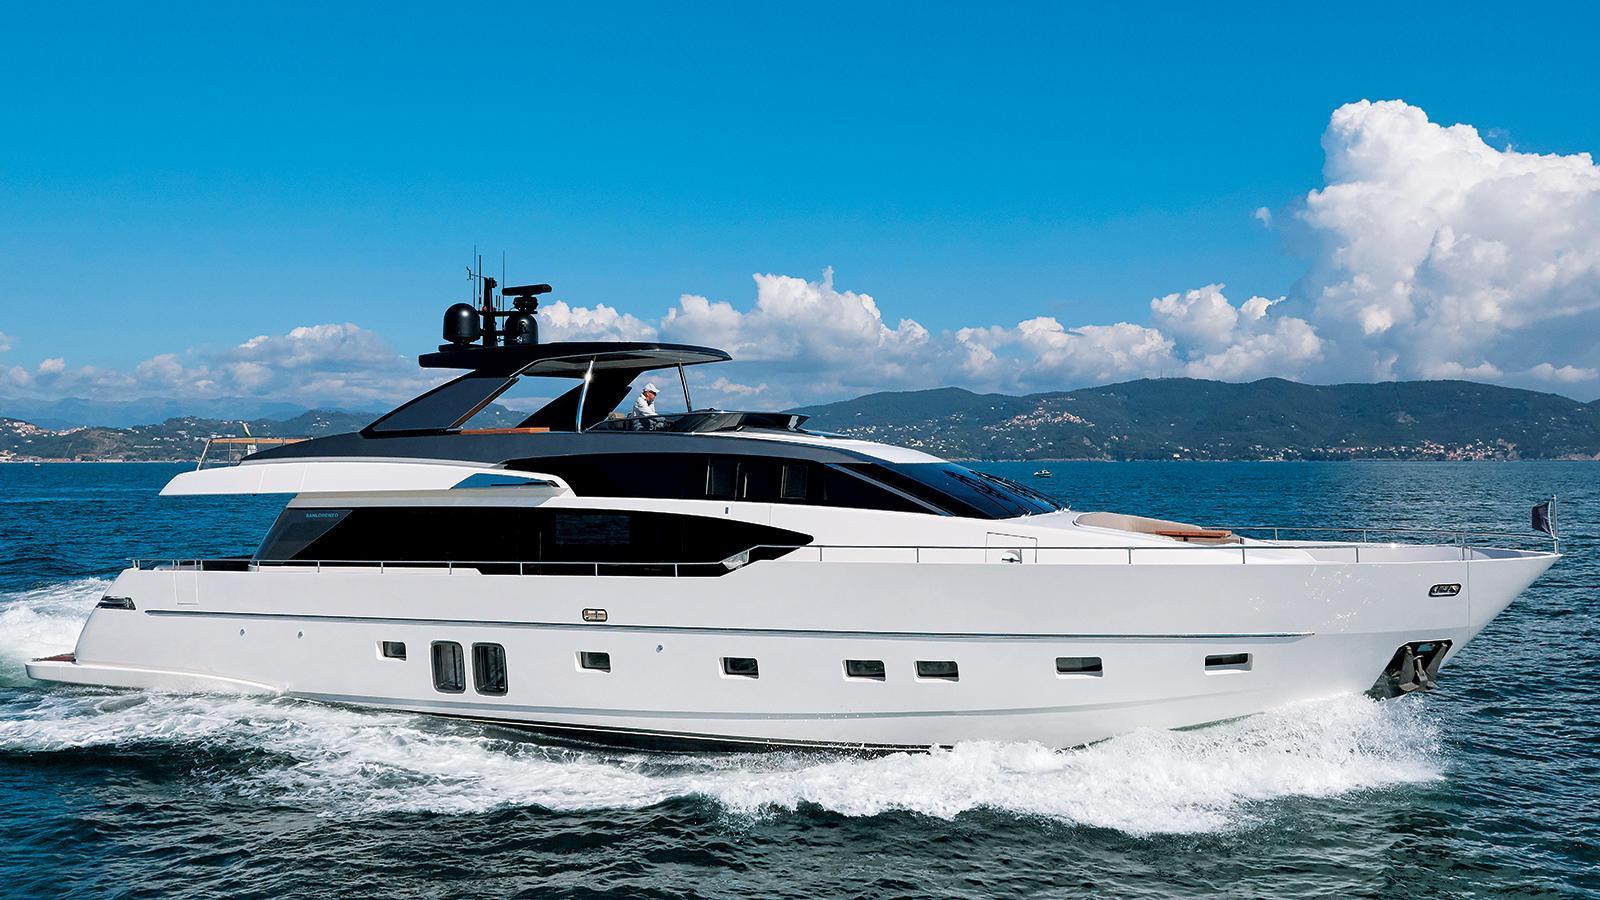 SL86 motoryacht sanlorenzo 27m 2019 side profile sistership